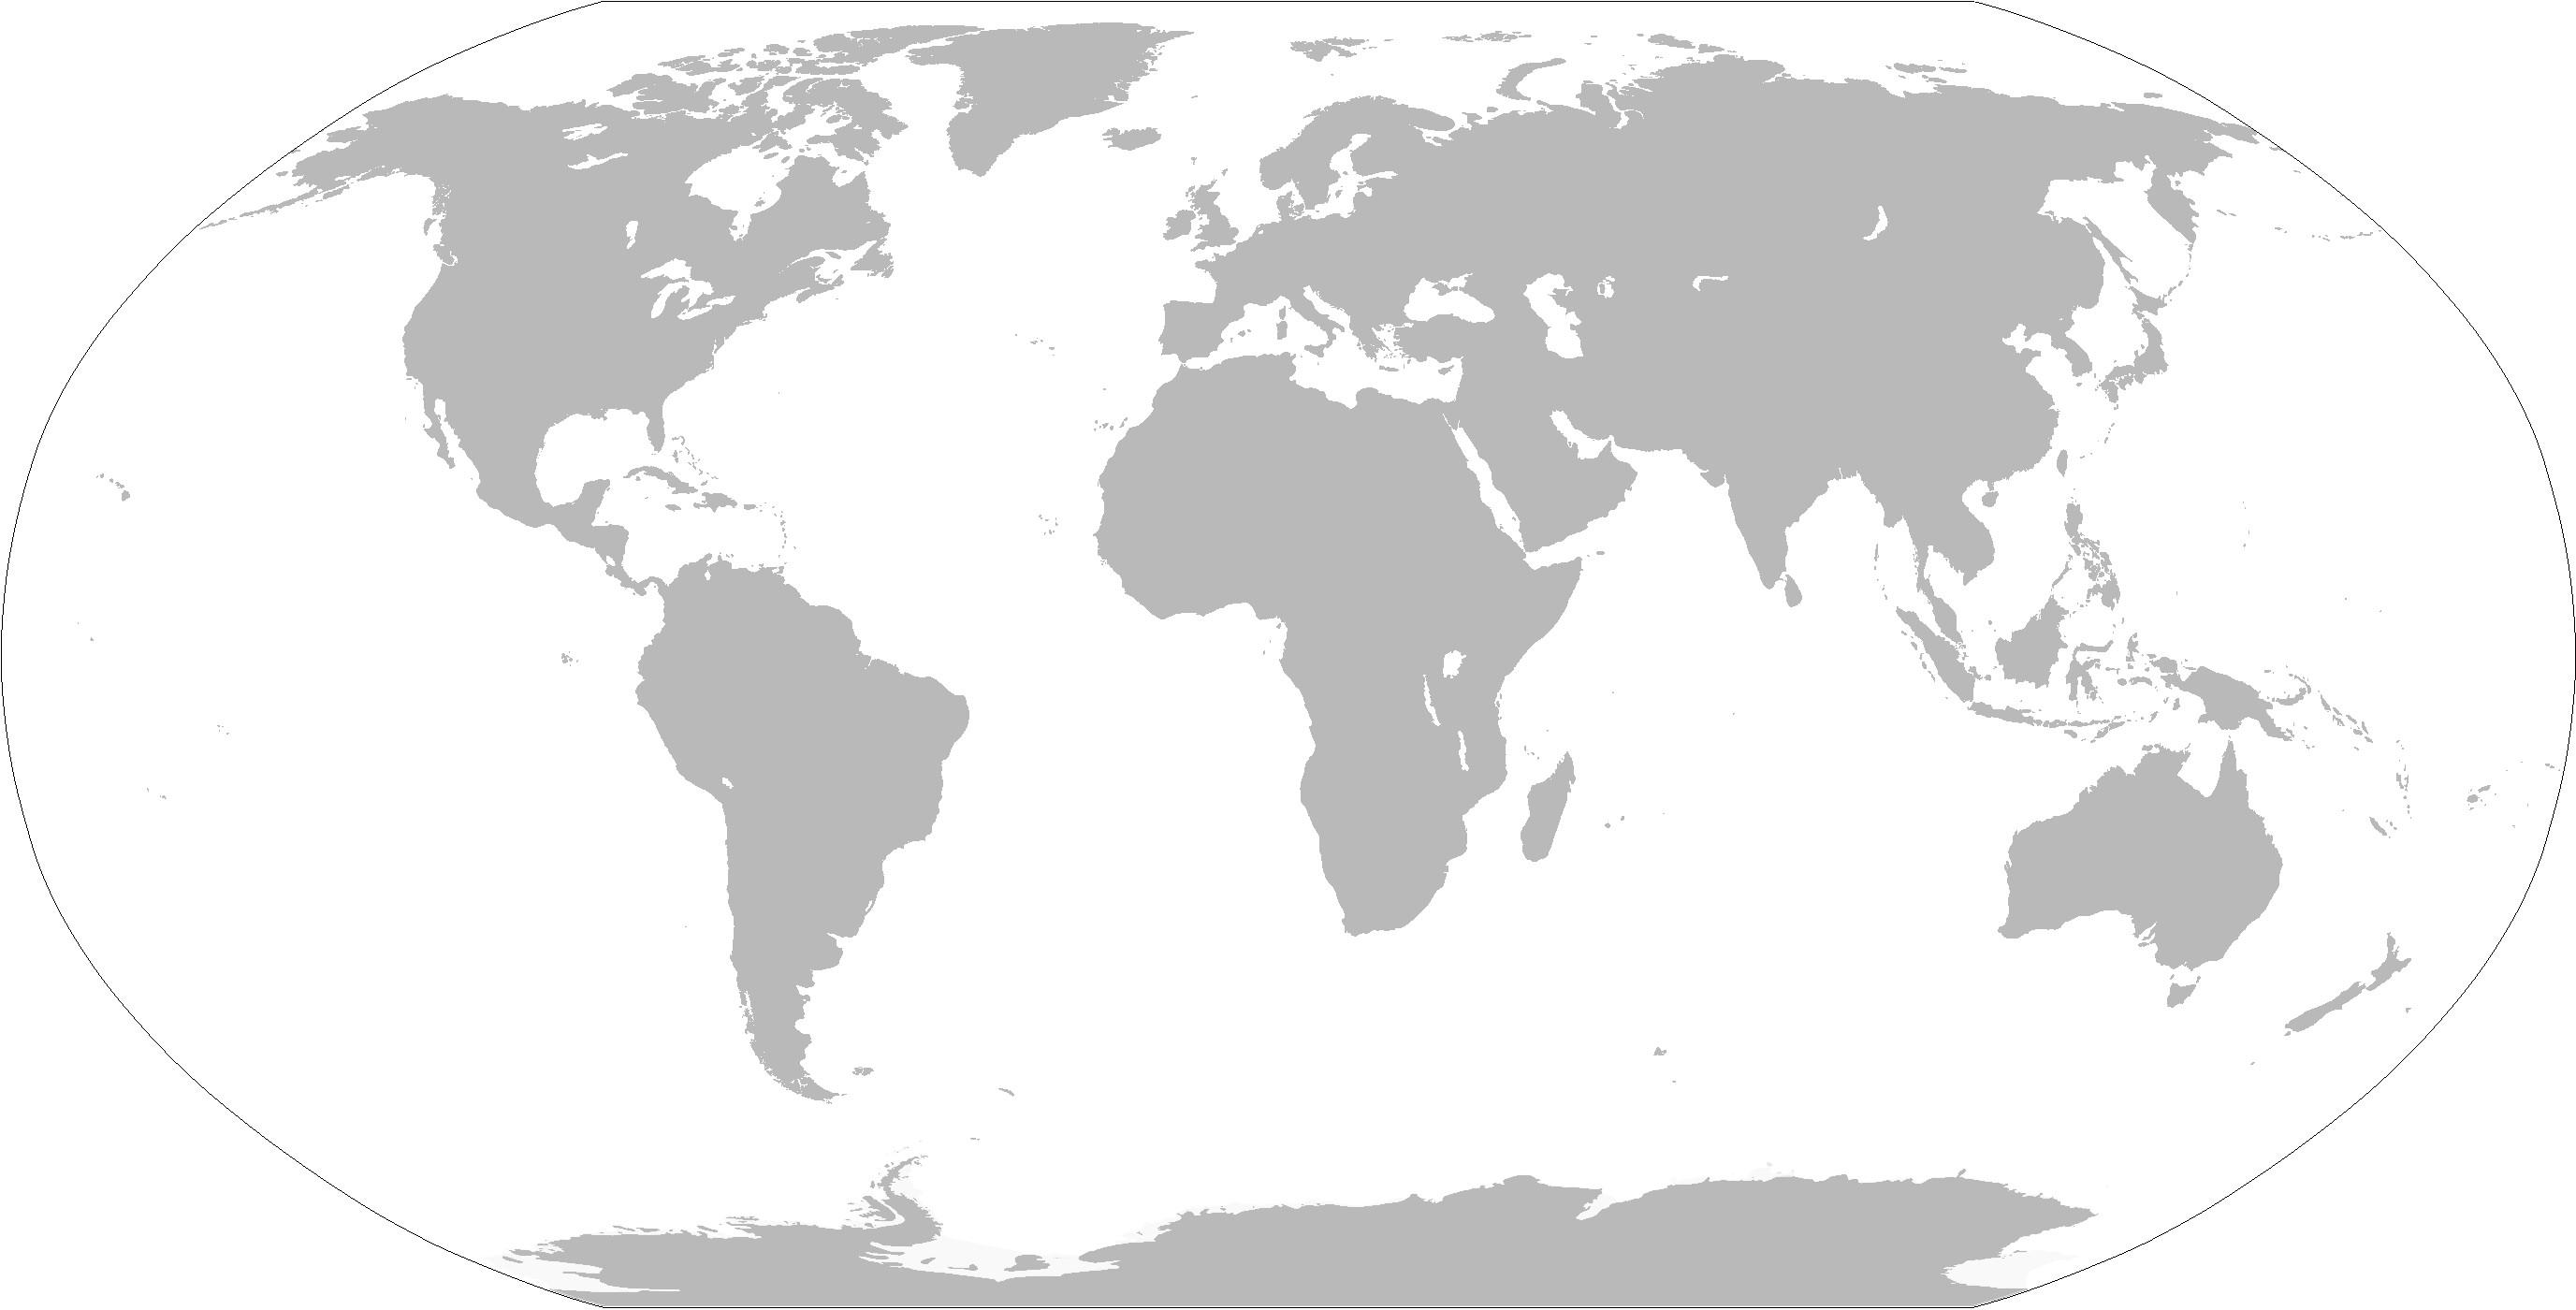 2753x1400 World Map Wallpaper 2017 World Map Vector Free Download. World